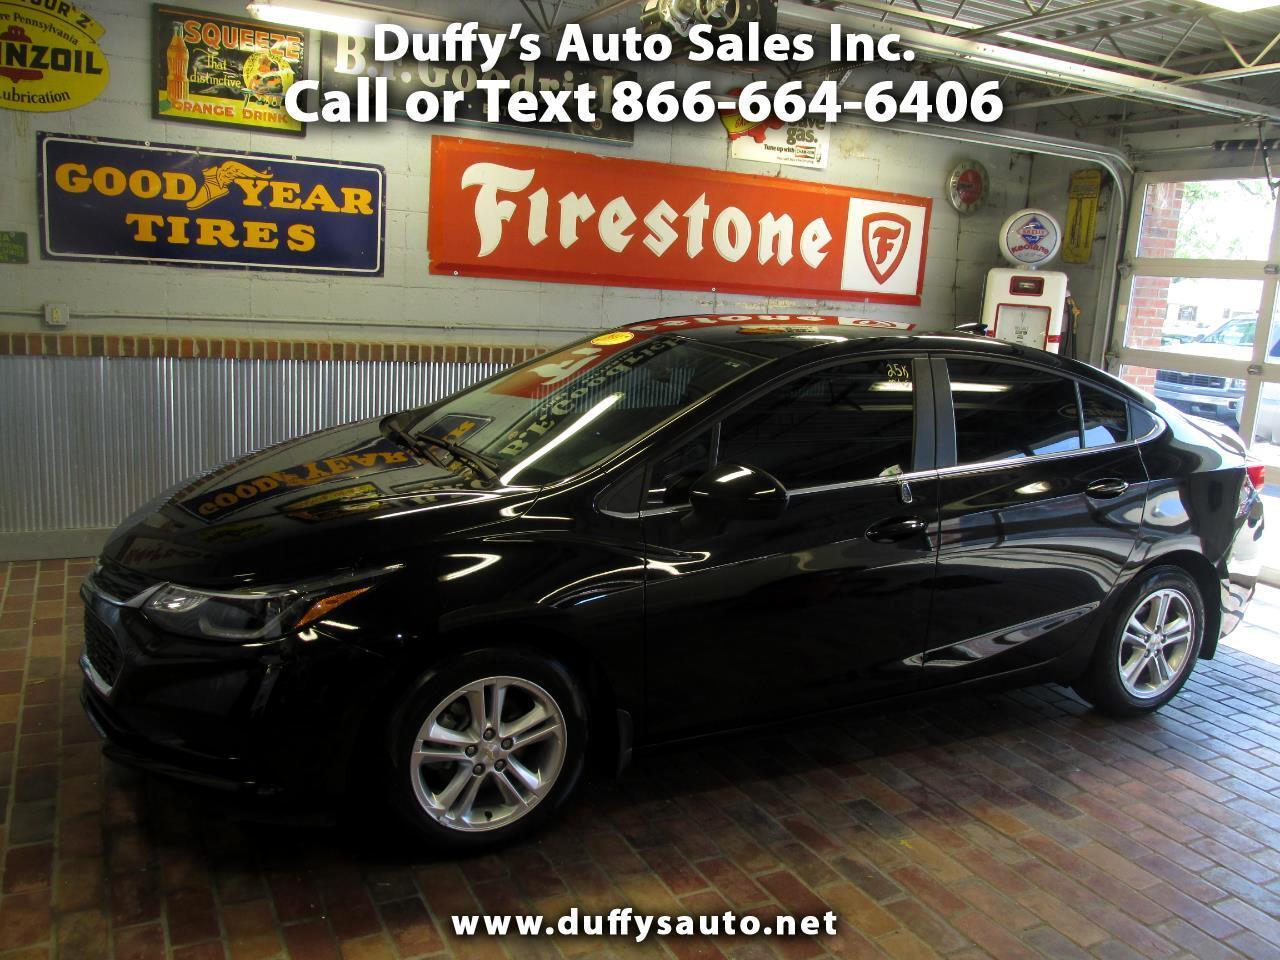 2017 Chevrolet Cruze 4dr Sdn 1.4L LT w/1SD